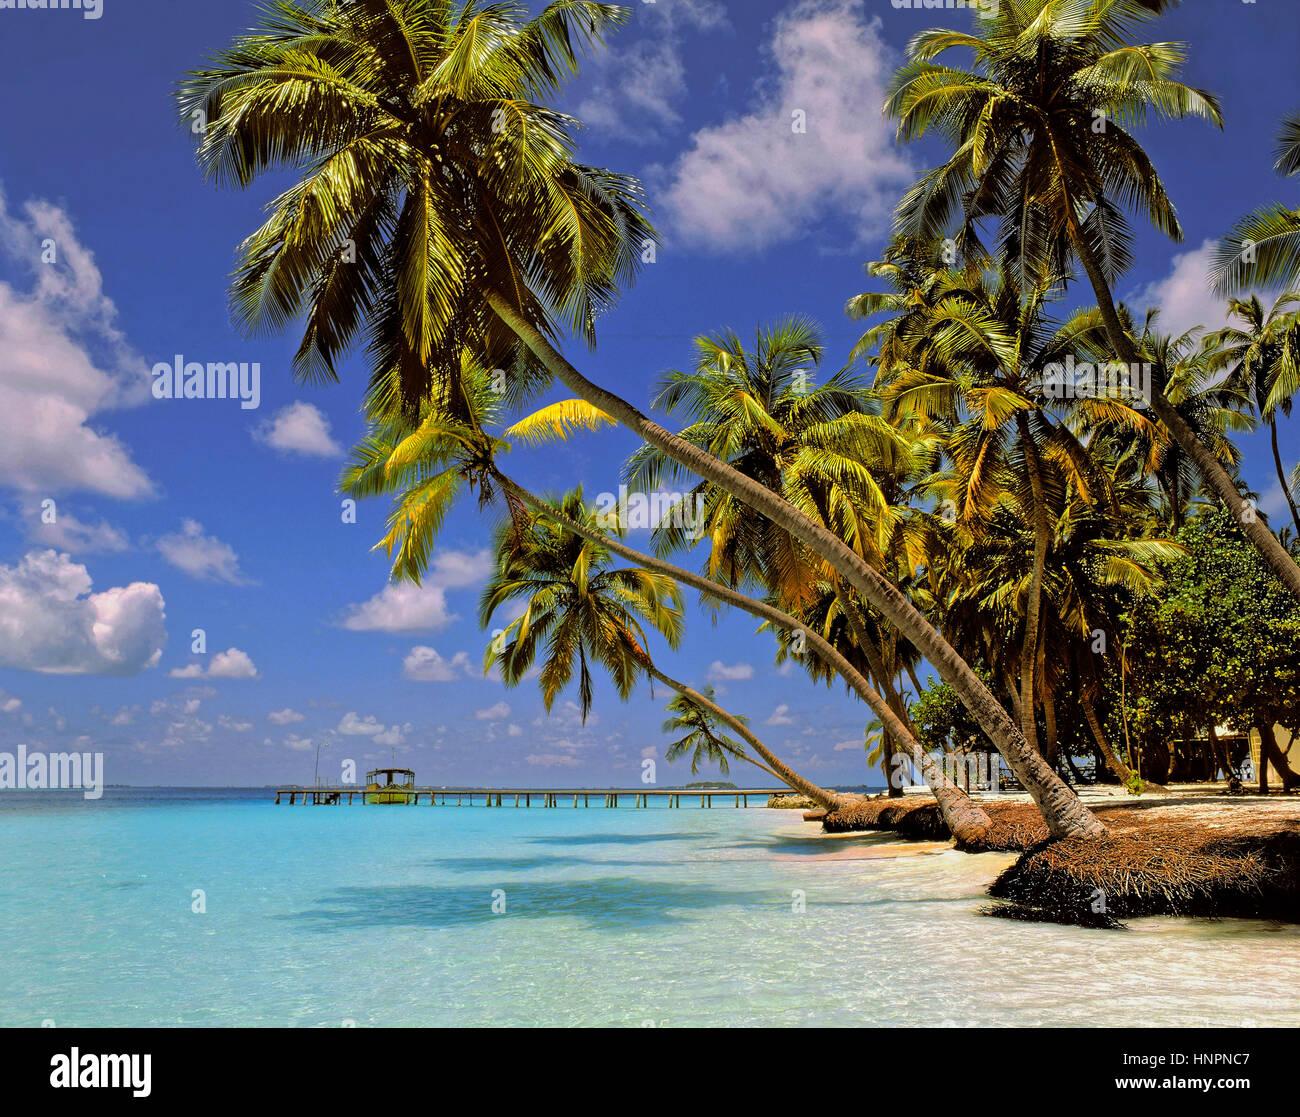 Kuda Bandos Island, North Male Atoll, Maldives, Maldive Republic, Indian Ocean Atoll Stock Photo